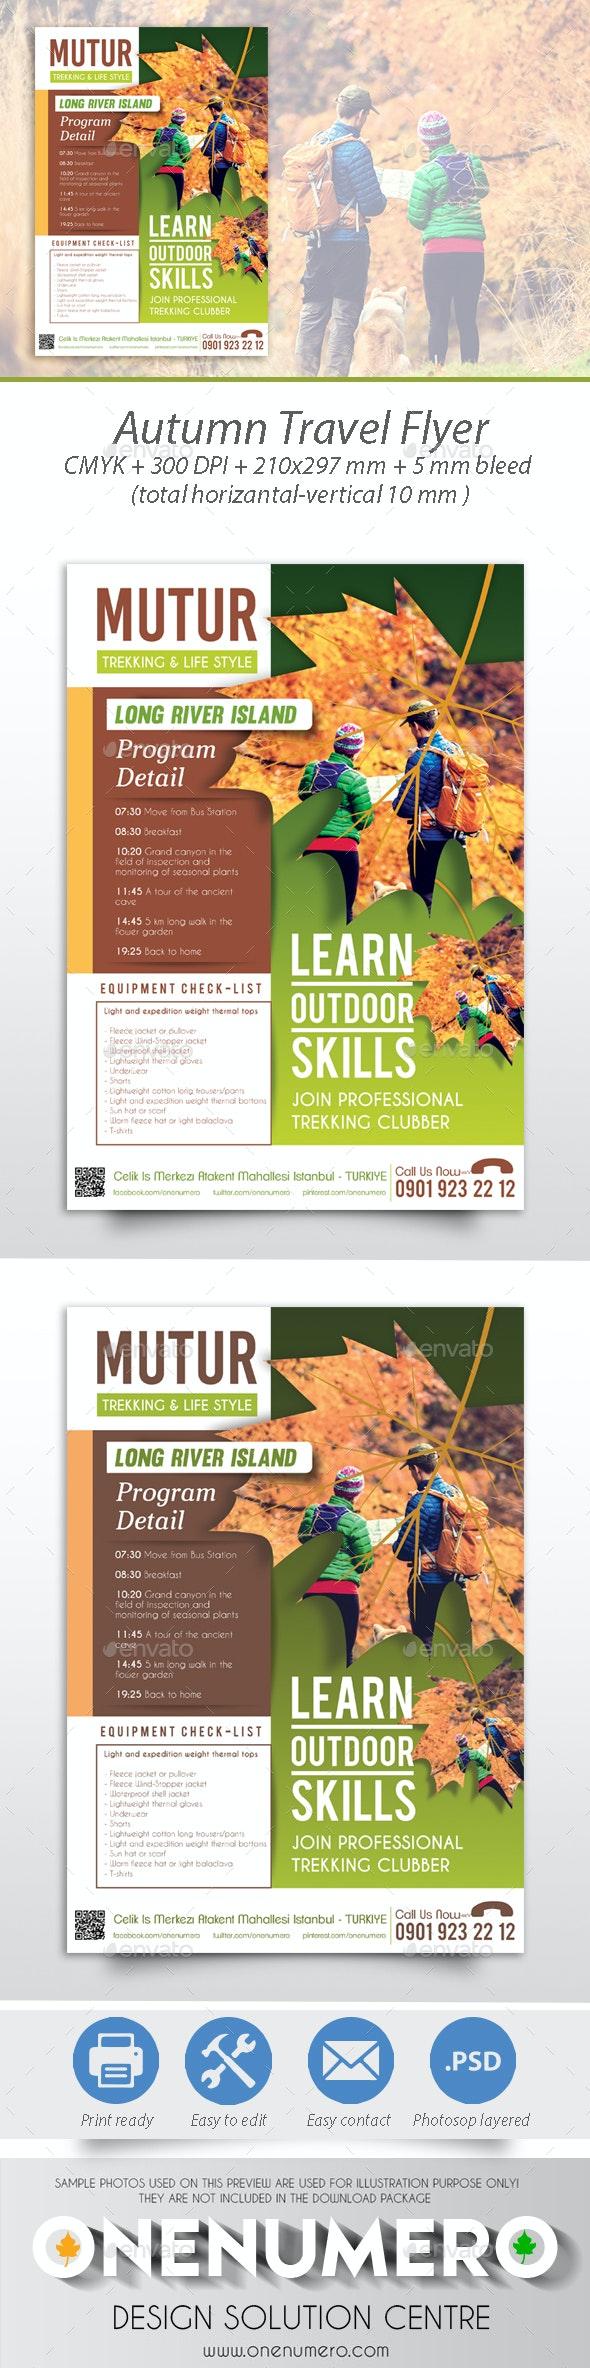 Autumn Travel Flyer - Corporate Flyers